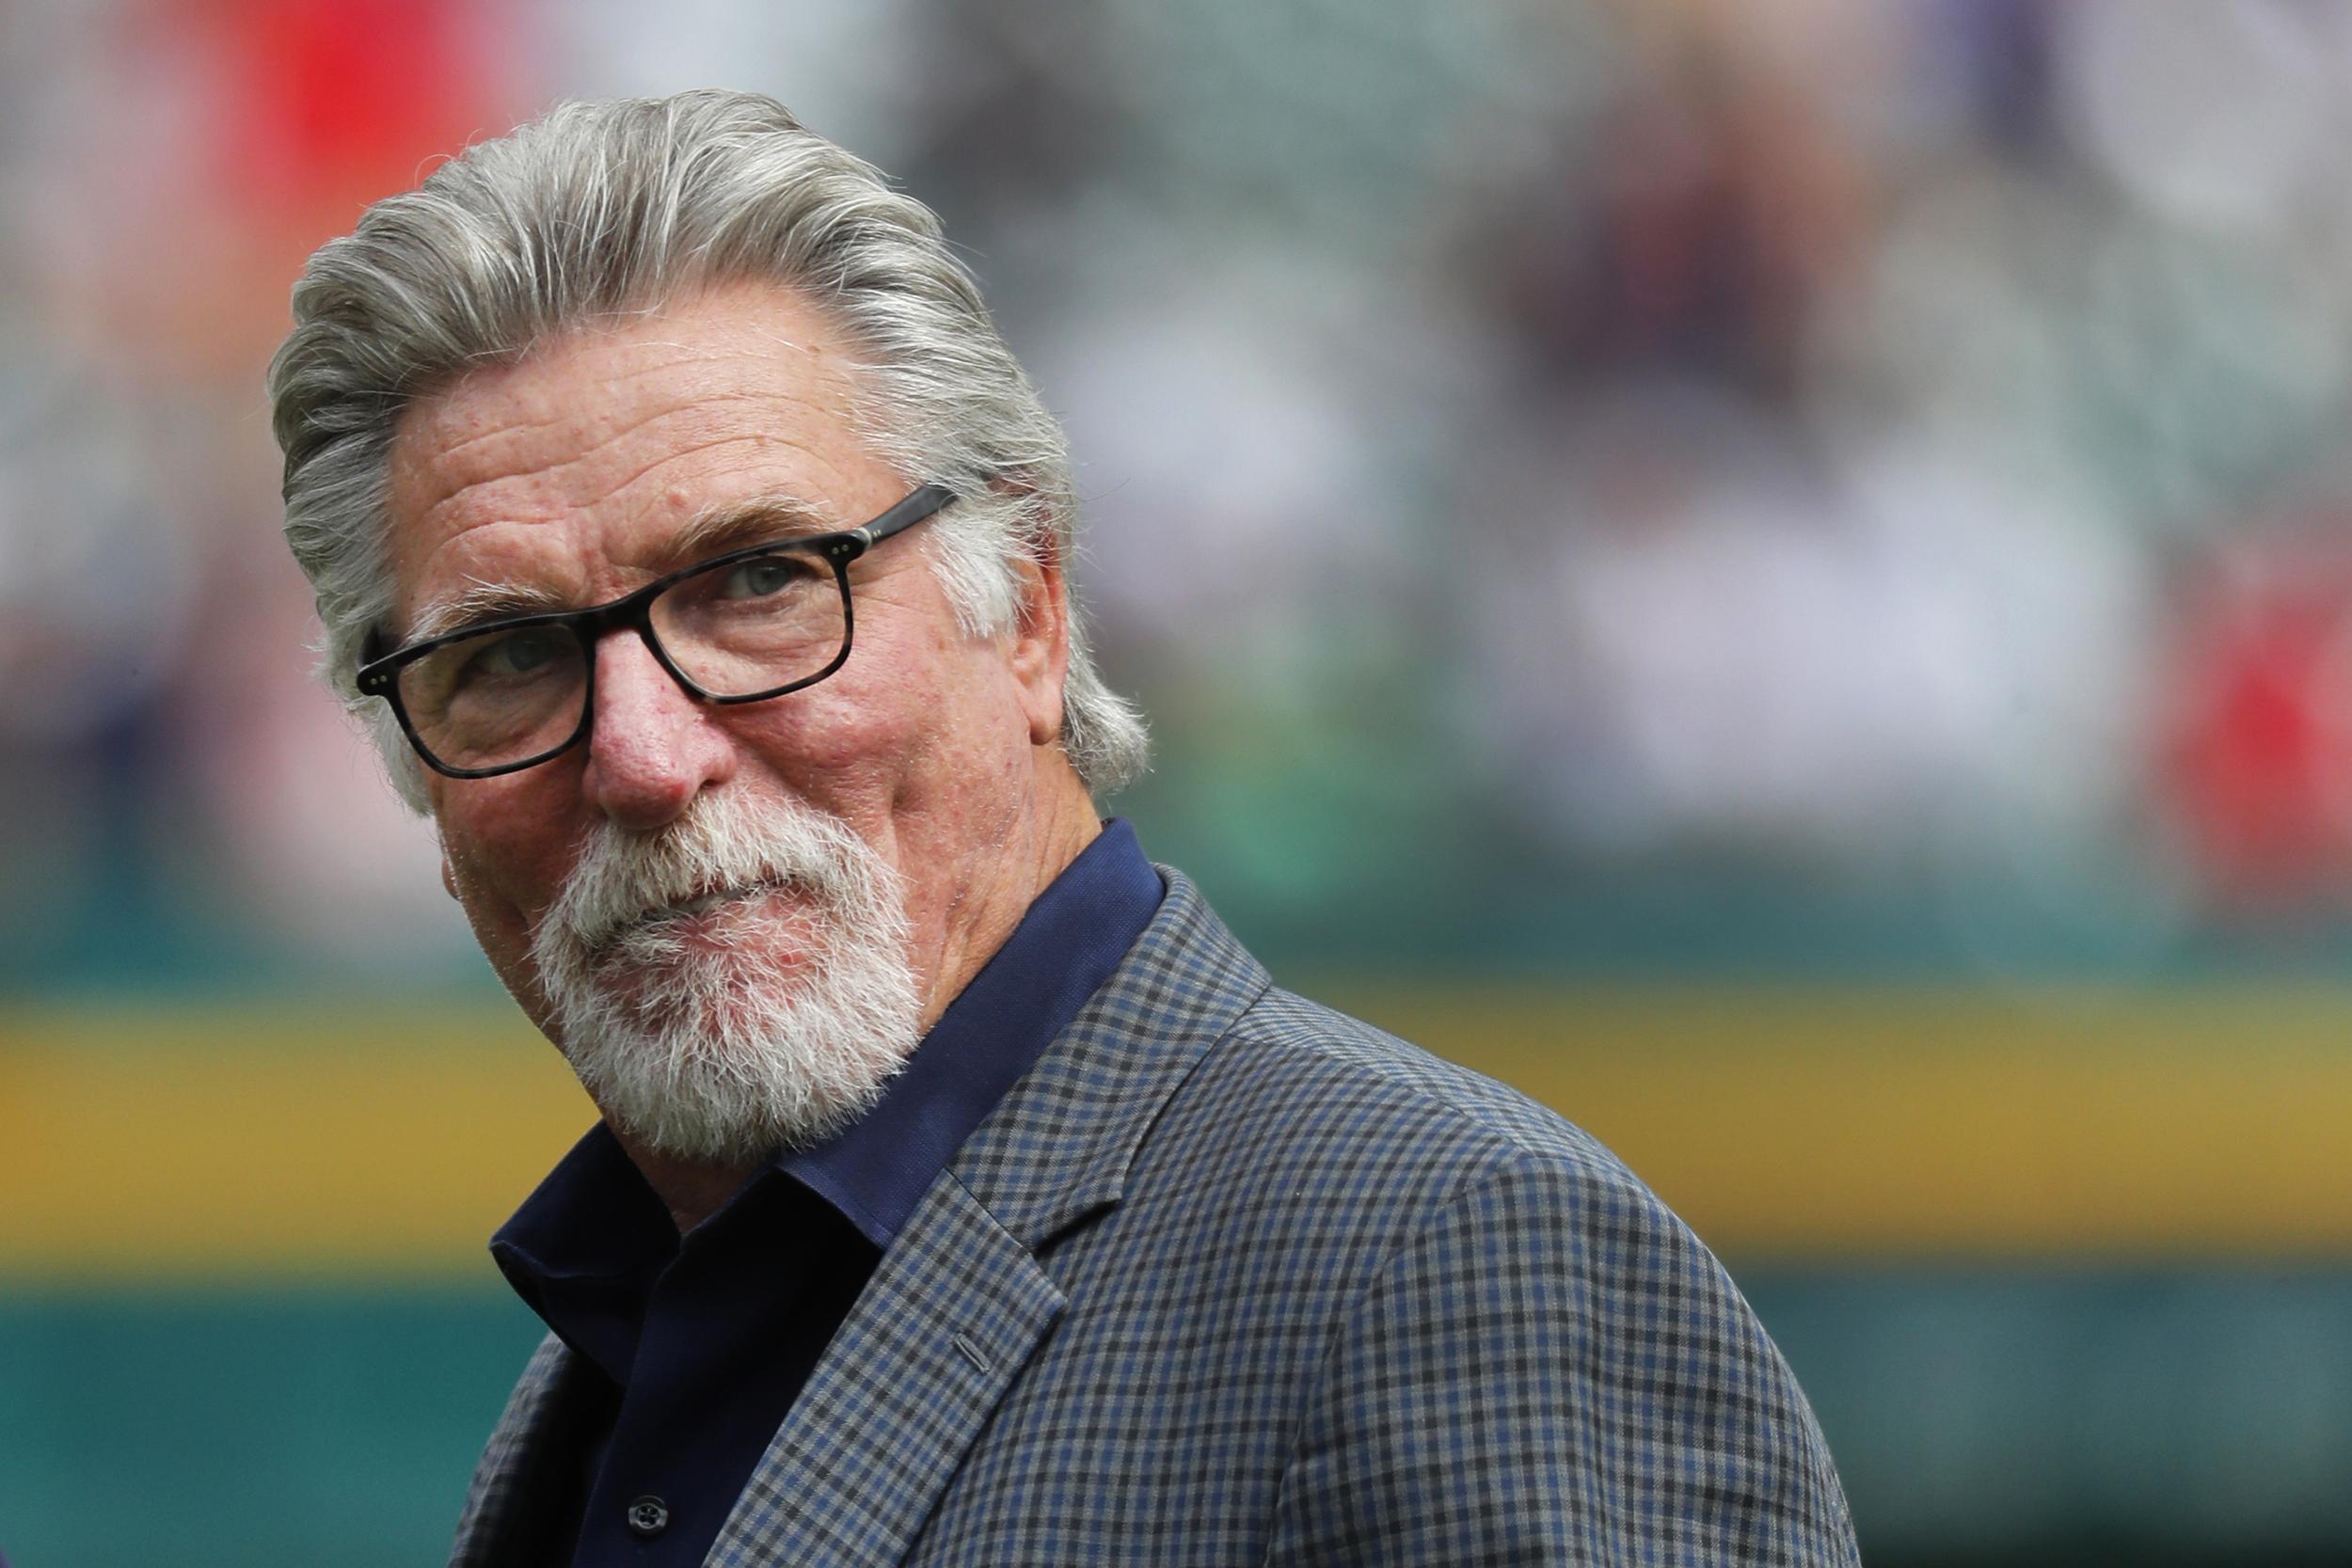 Baseball announcer Jack Morris suspended indefinitely for racist remark about Shohei Ohtani